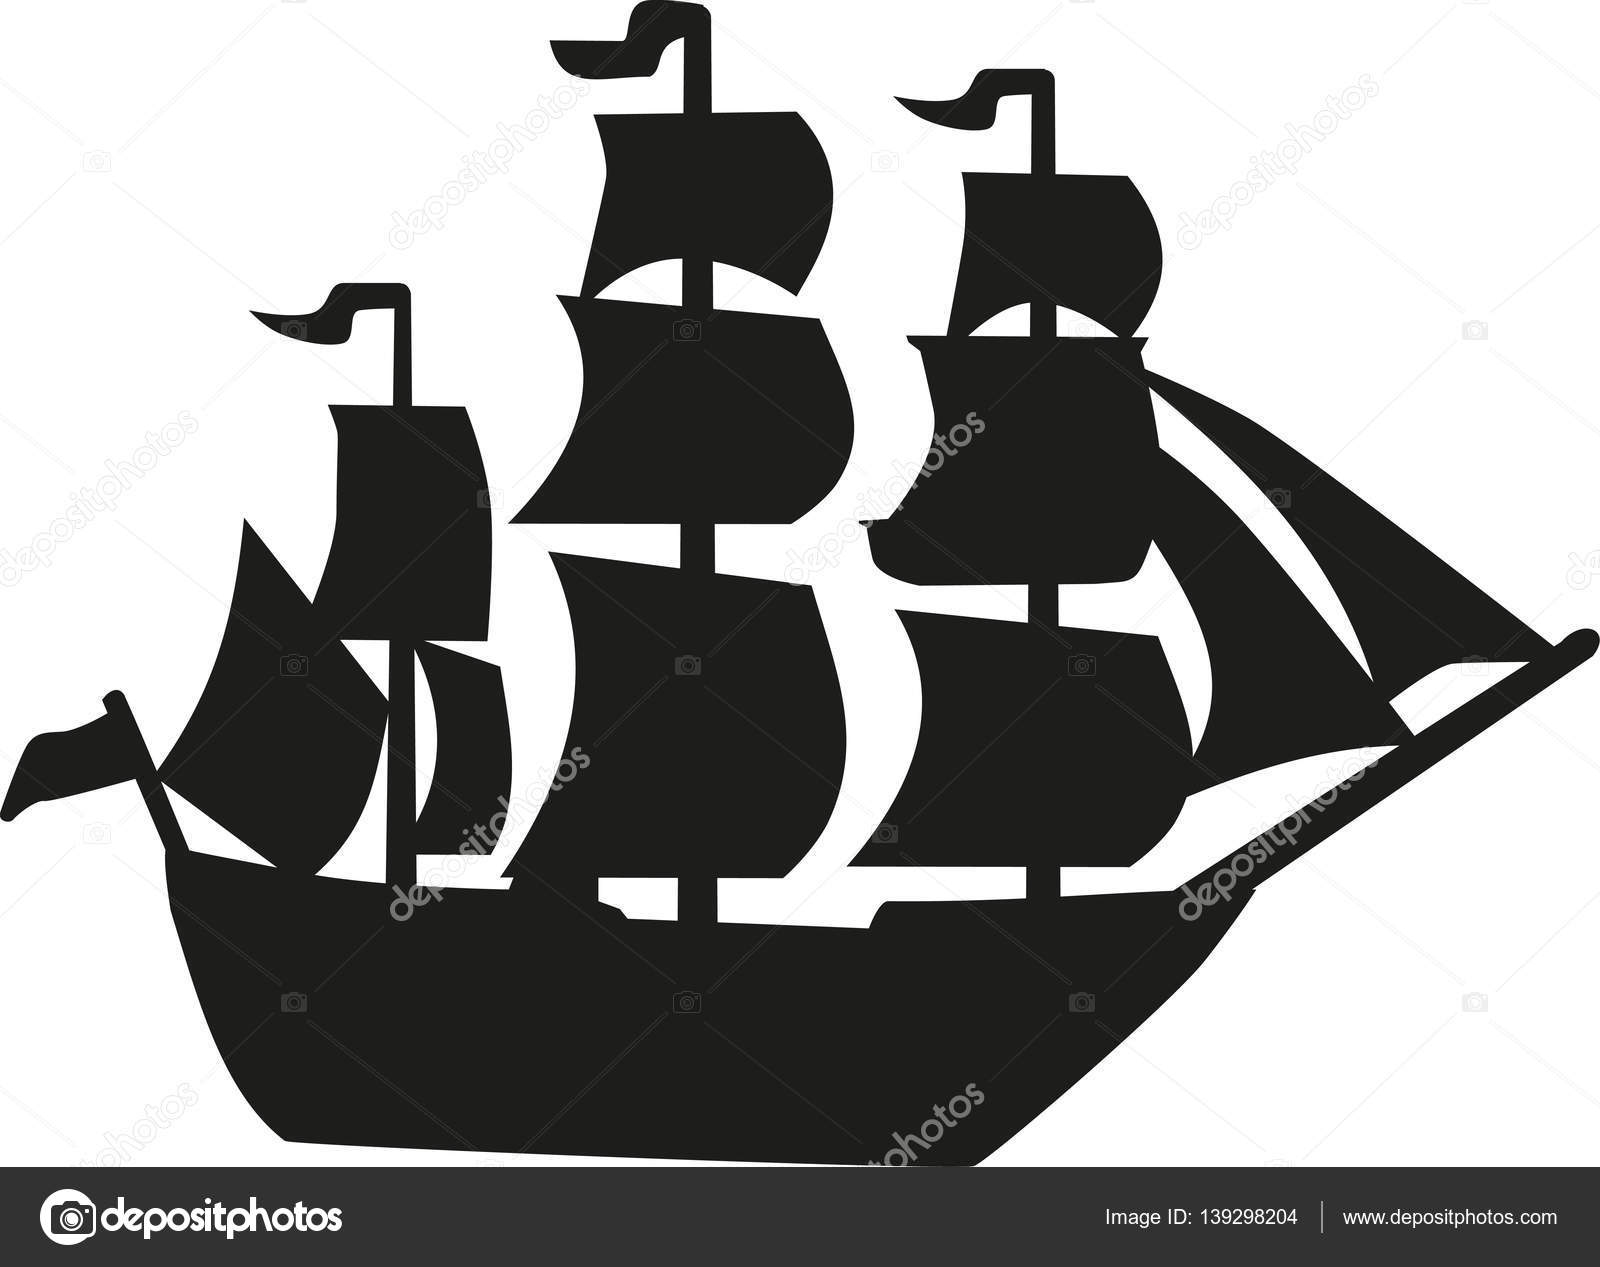 pirate ship vector stock vector miceking 139298204 rh depositphotos com pirate ship vector free pirate ship vector image